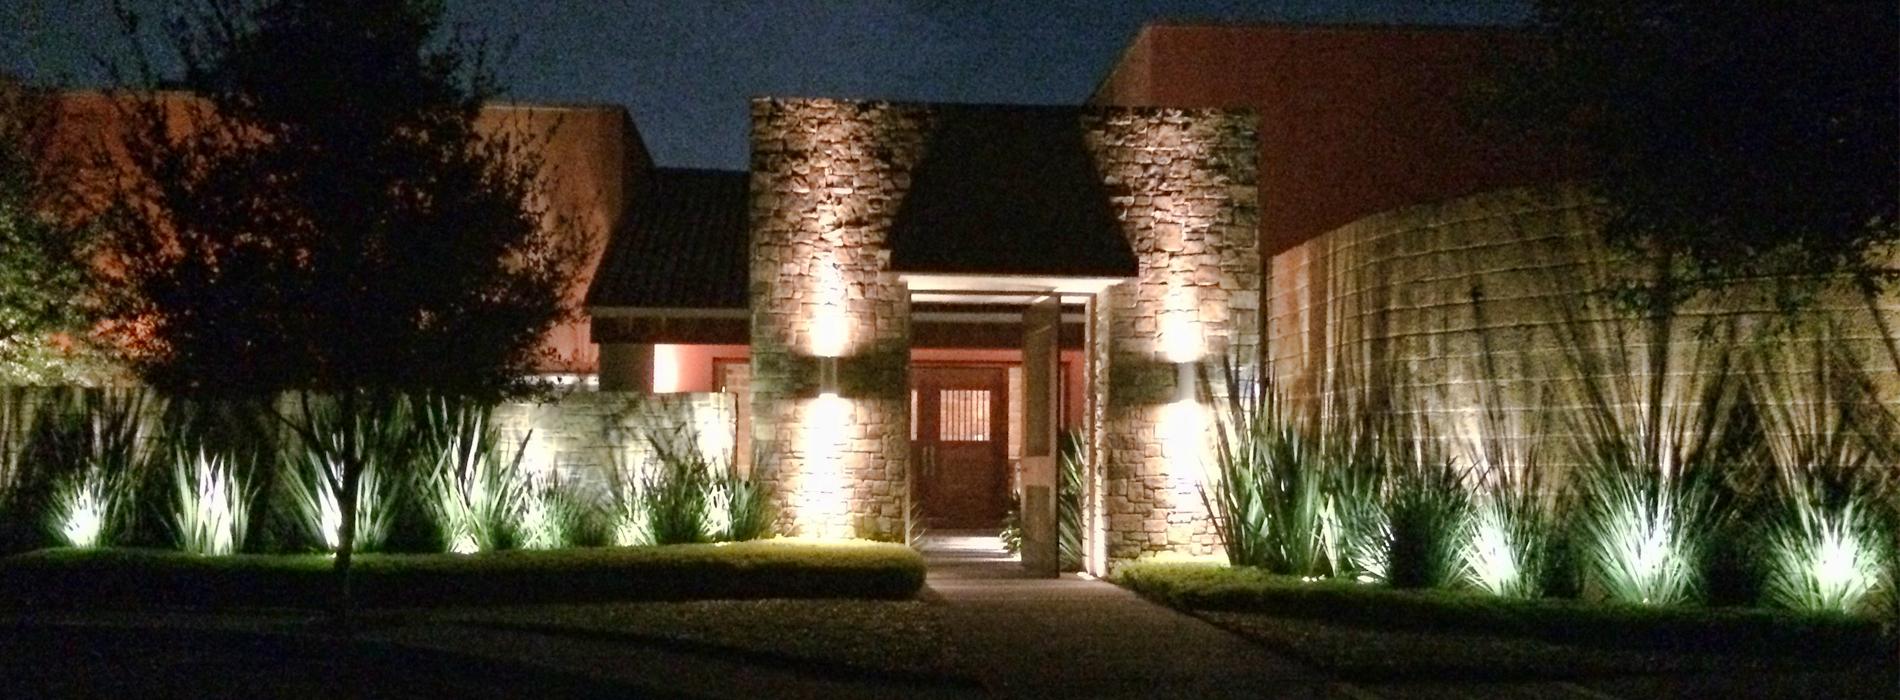 Lumipro focos para jardin iluminaci n de exterior for Luces de exterior para jardin